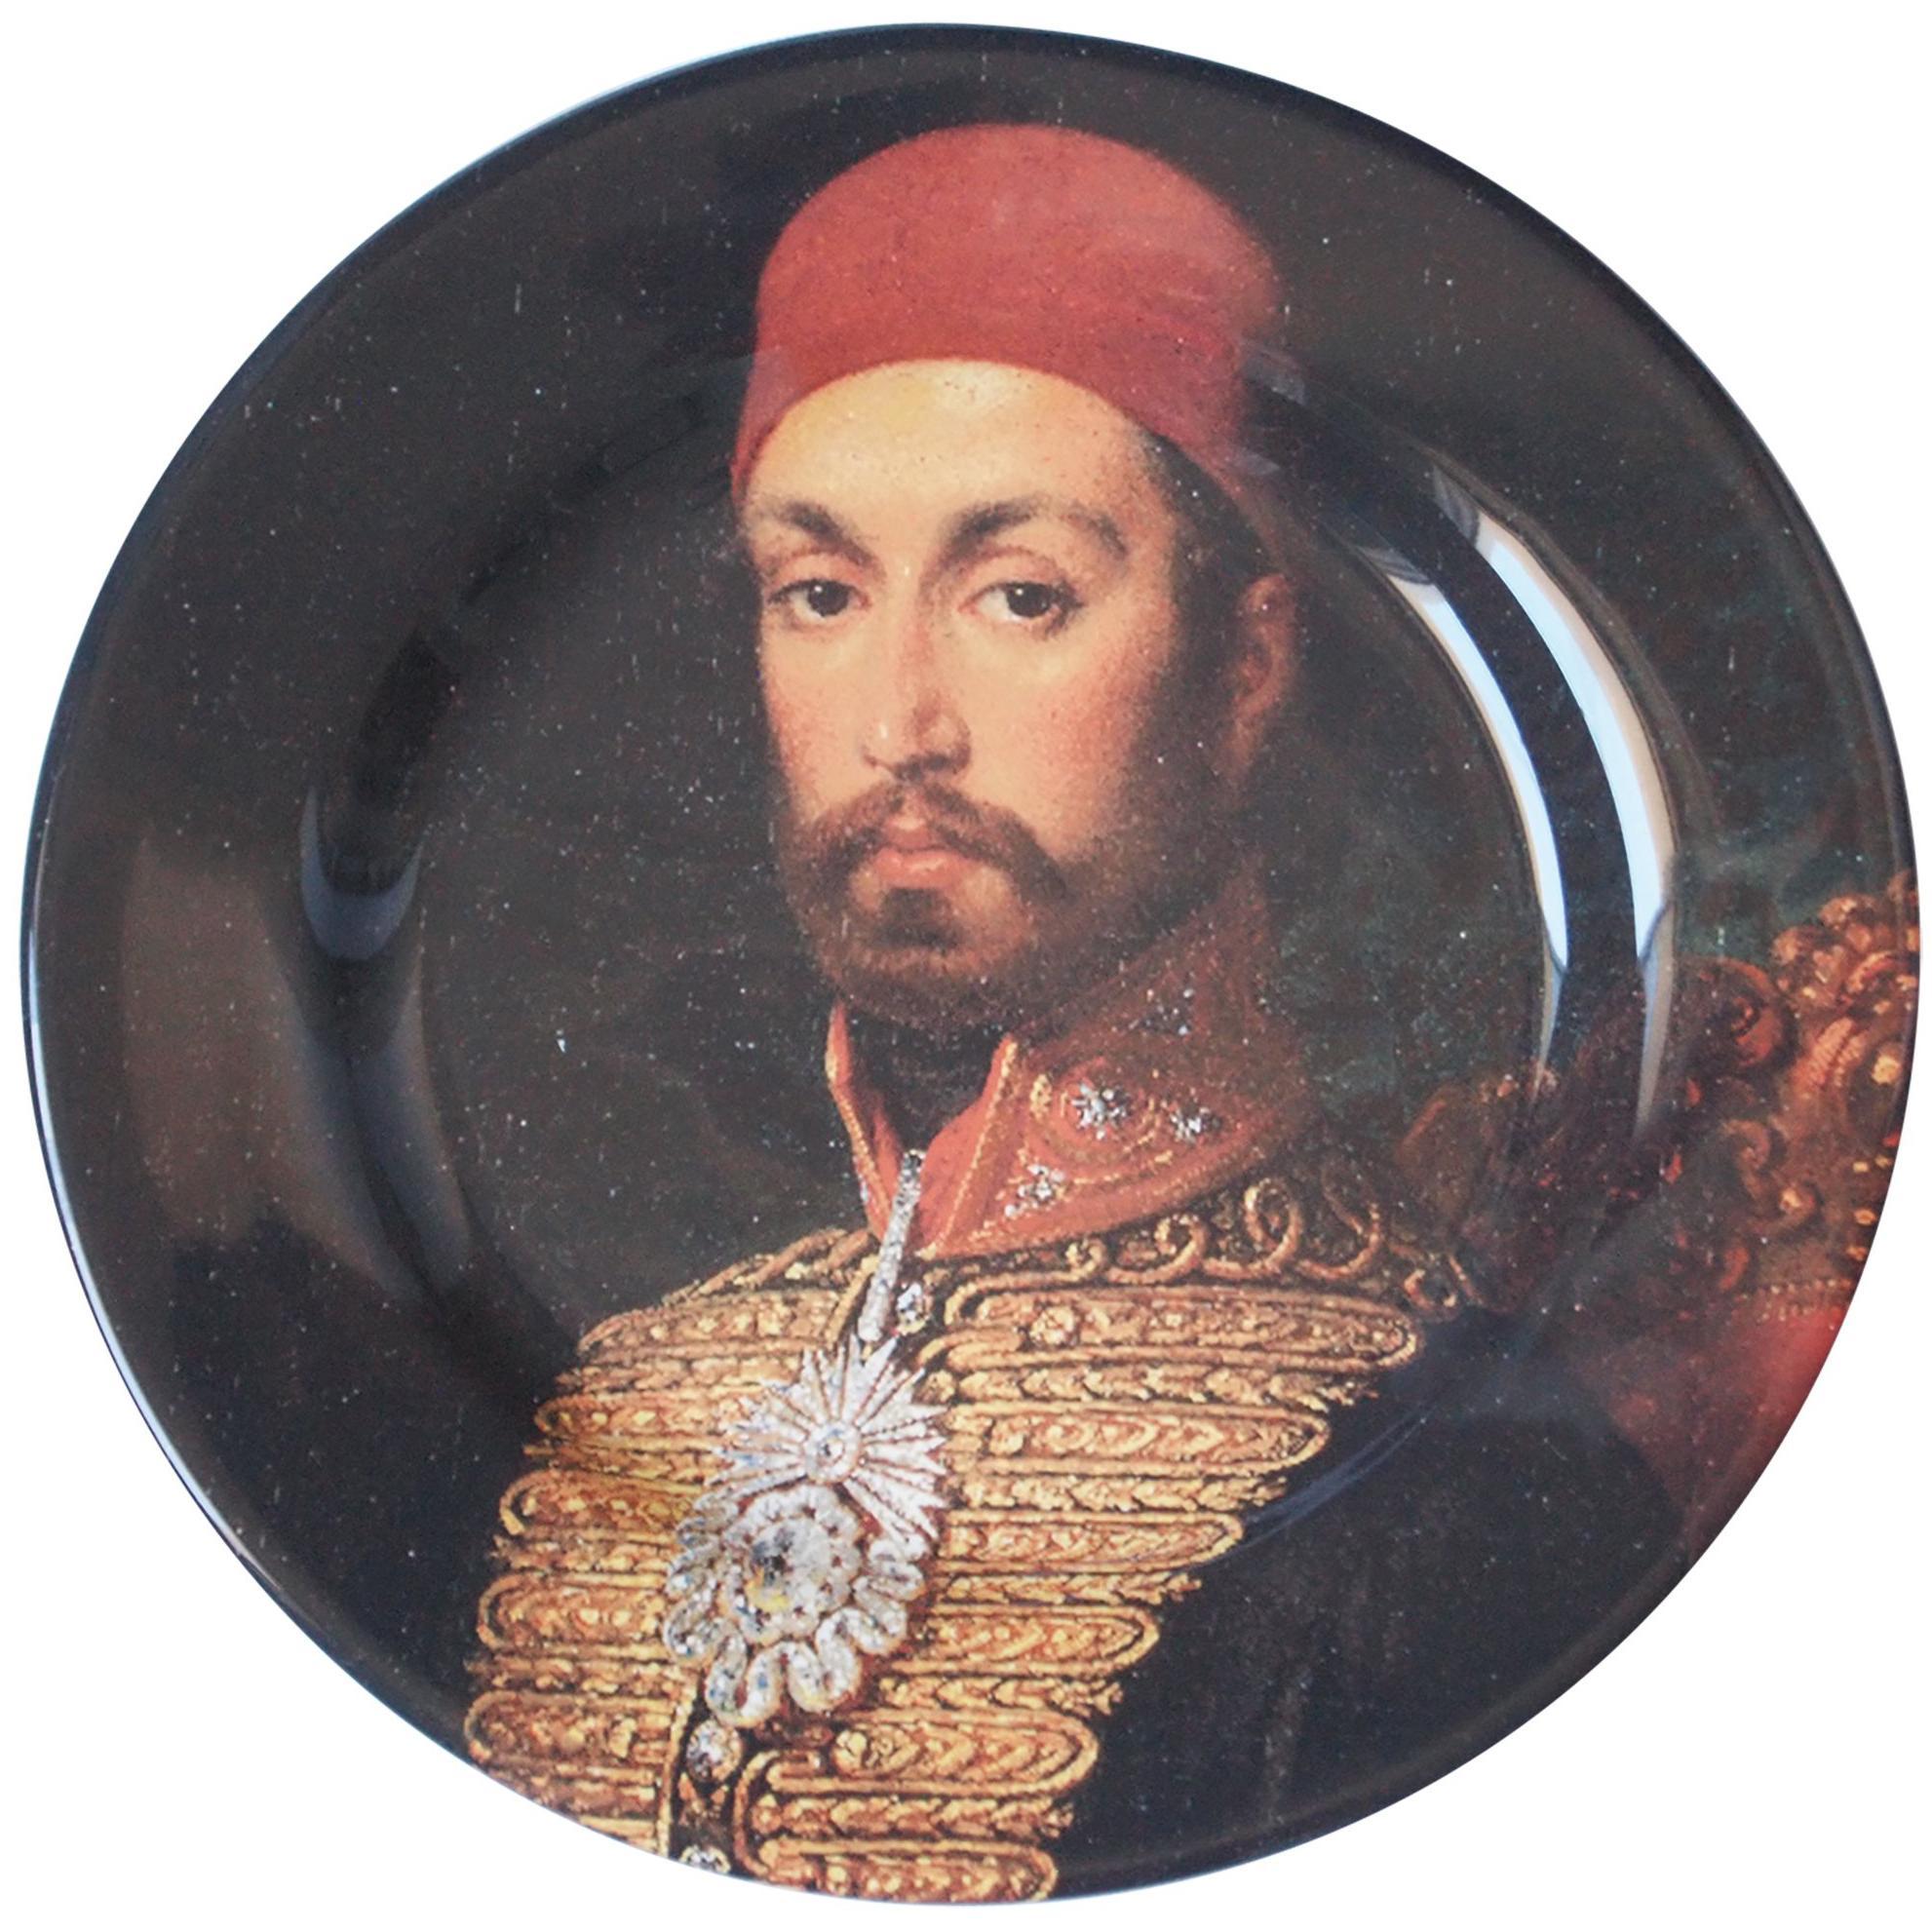 Handmade Sultan Abdulmecid Ceramic Plate